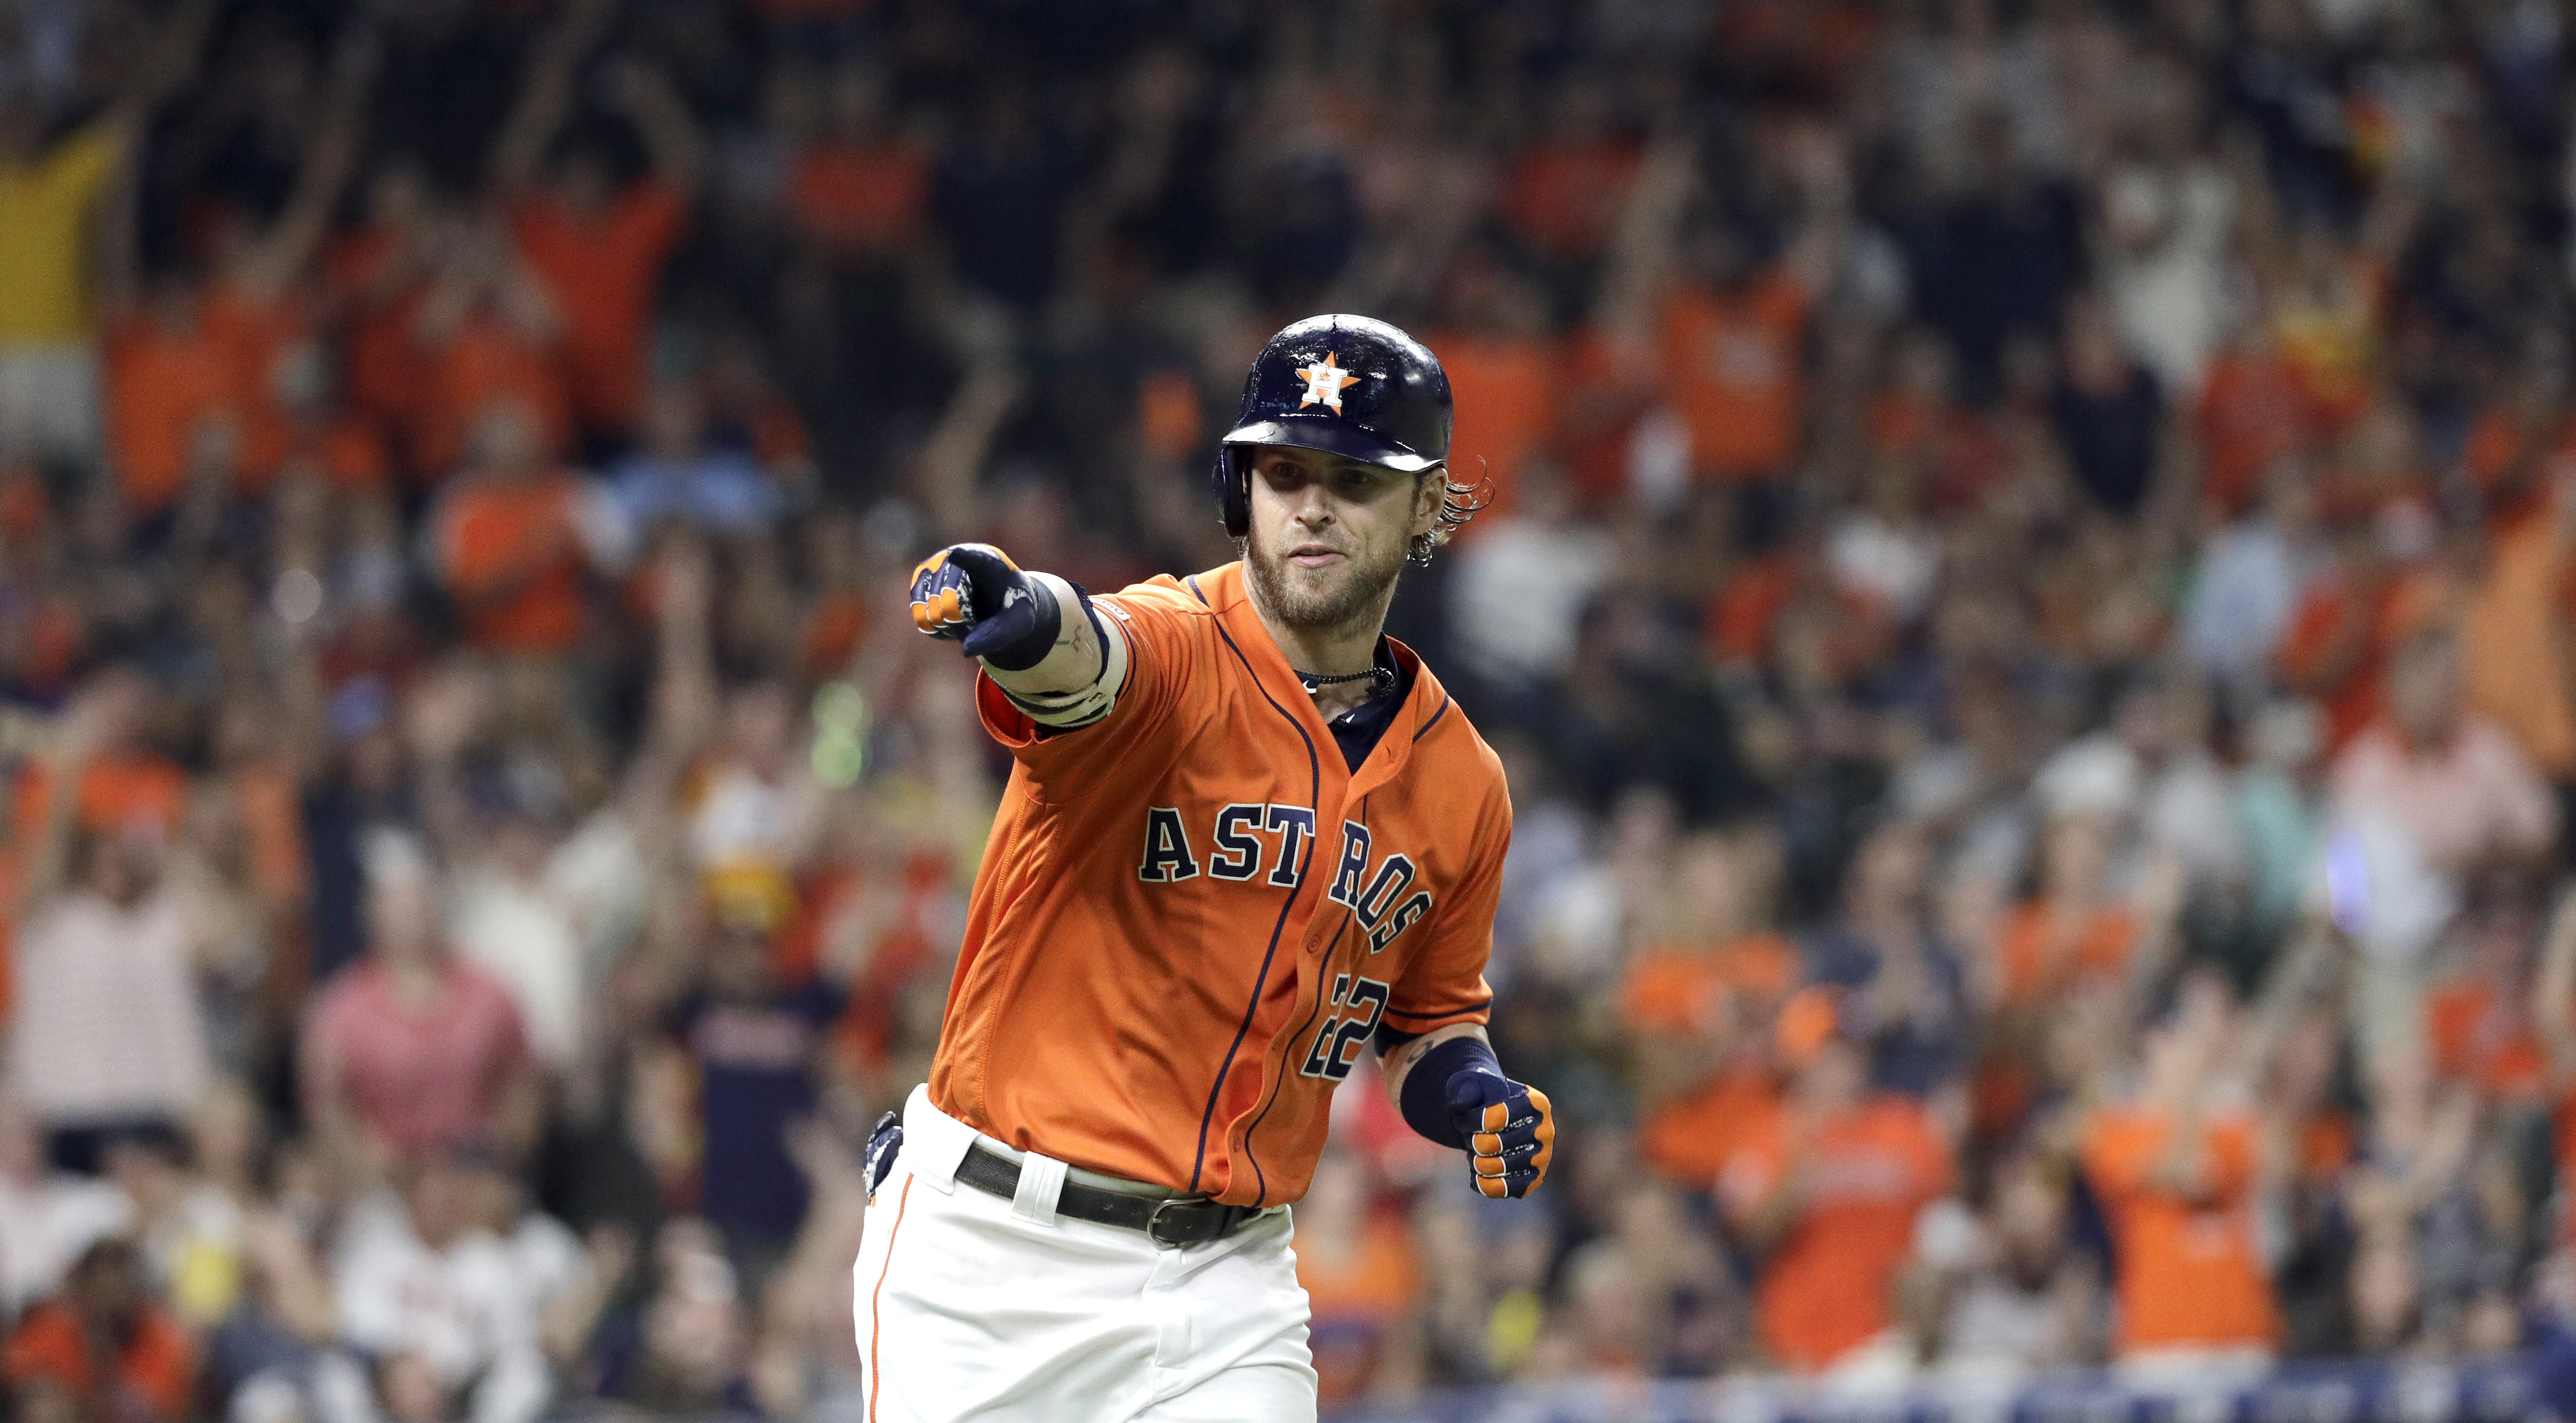 Reddick homers again as Astros beat Mariners 7-4